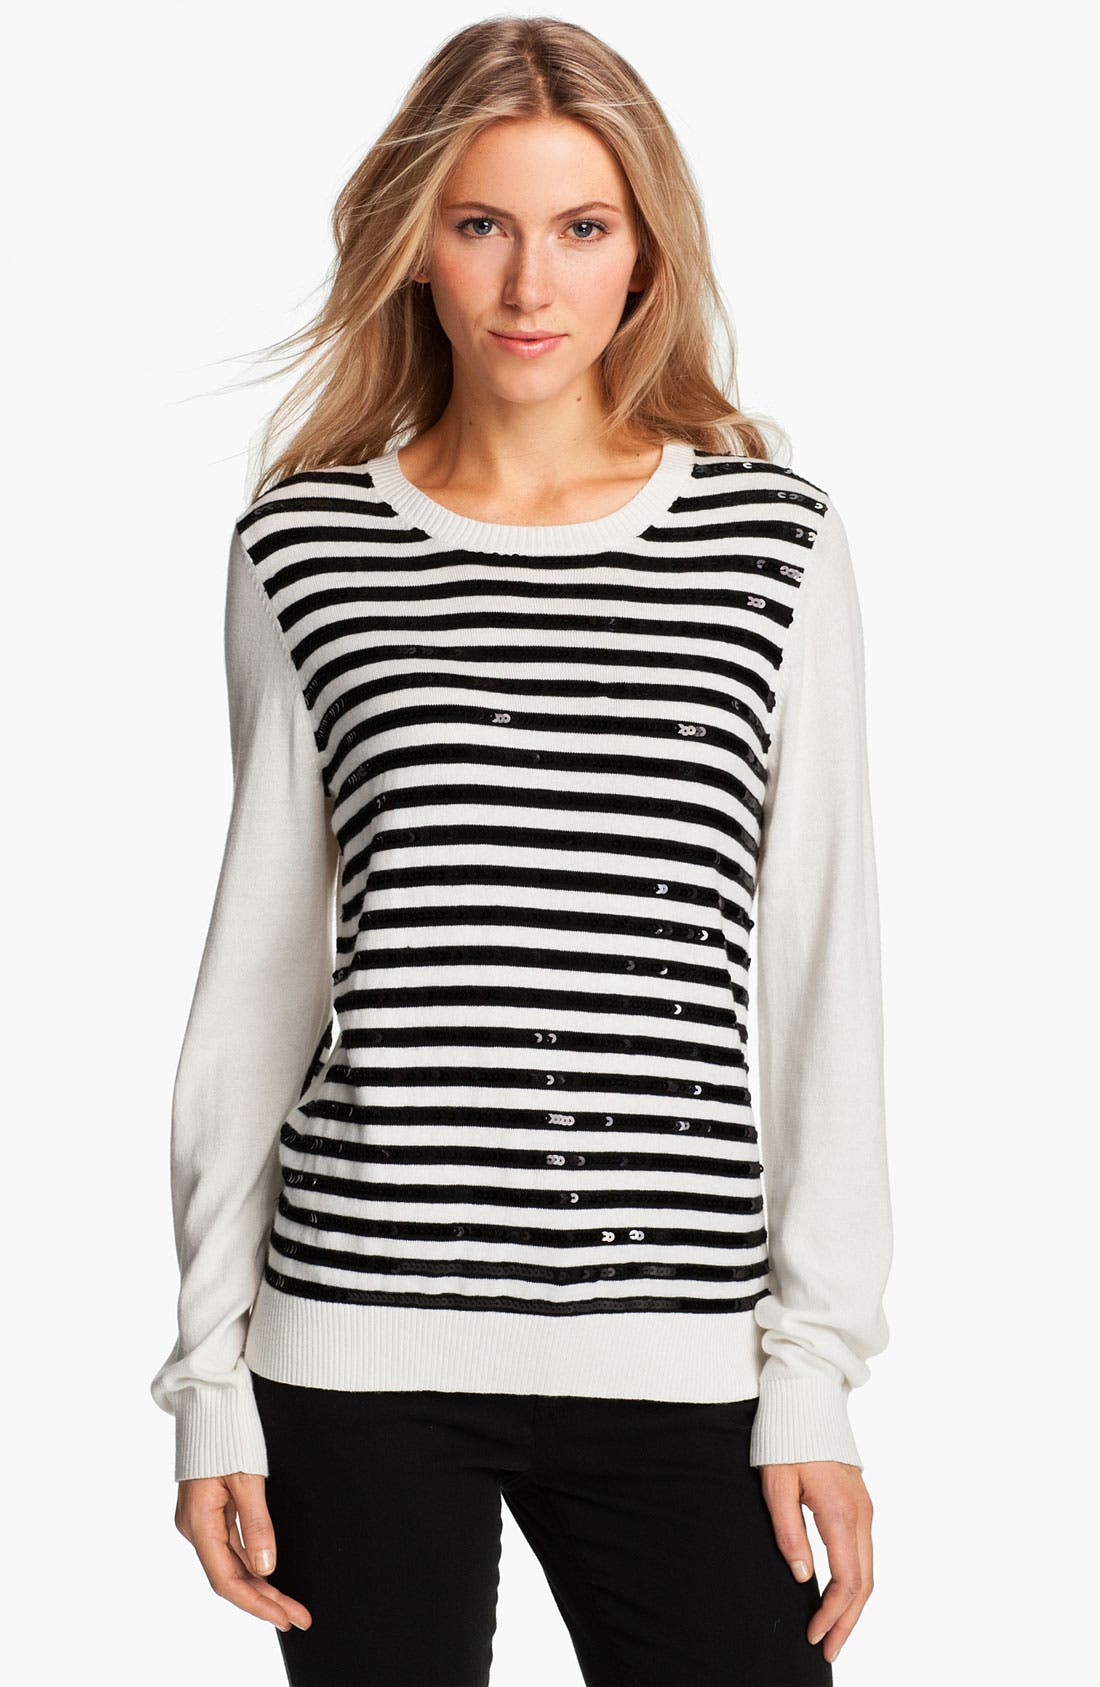 Alternate Image 1 Selected - MICHAEL Michael Kors Sequin Stripe Sweater